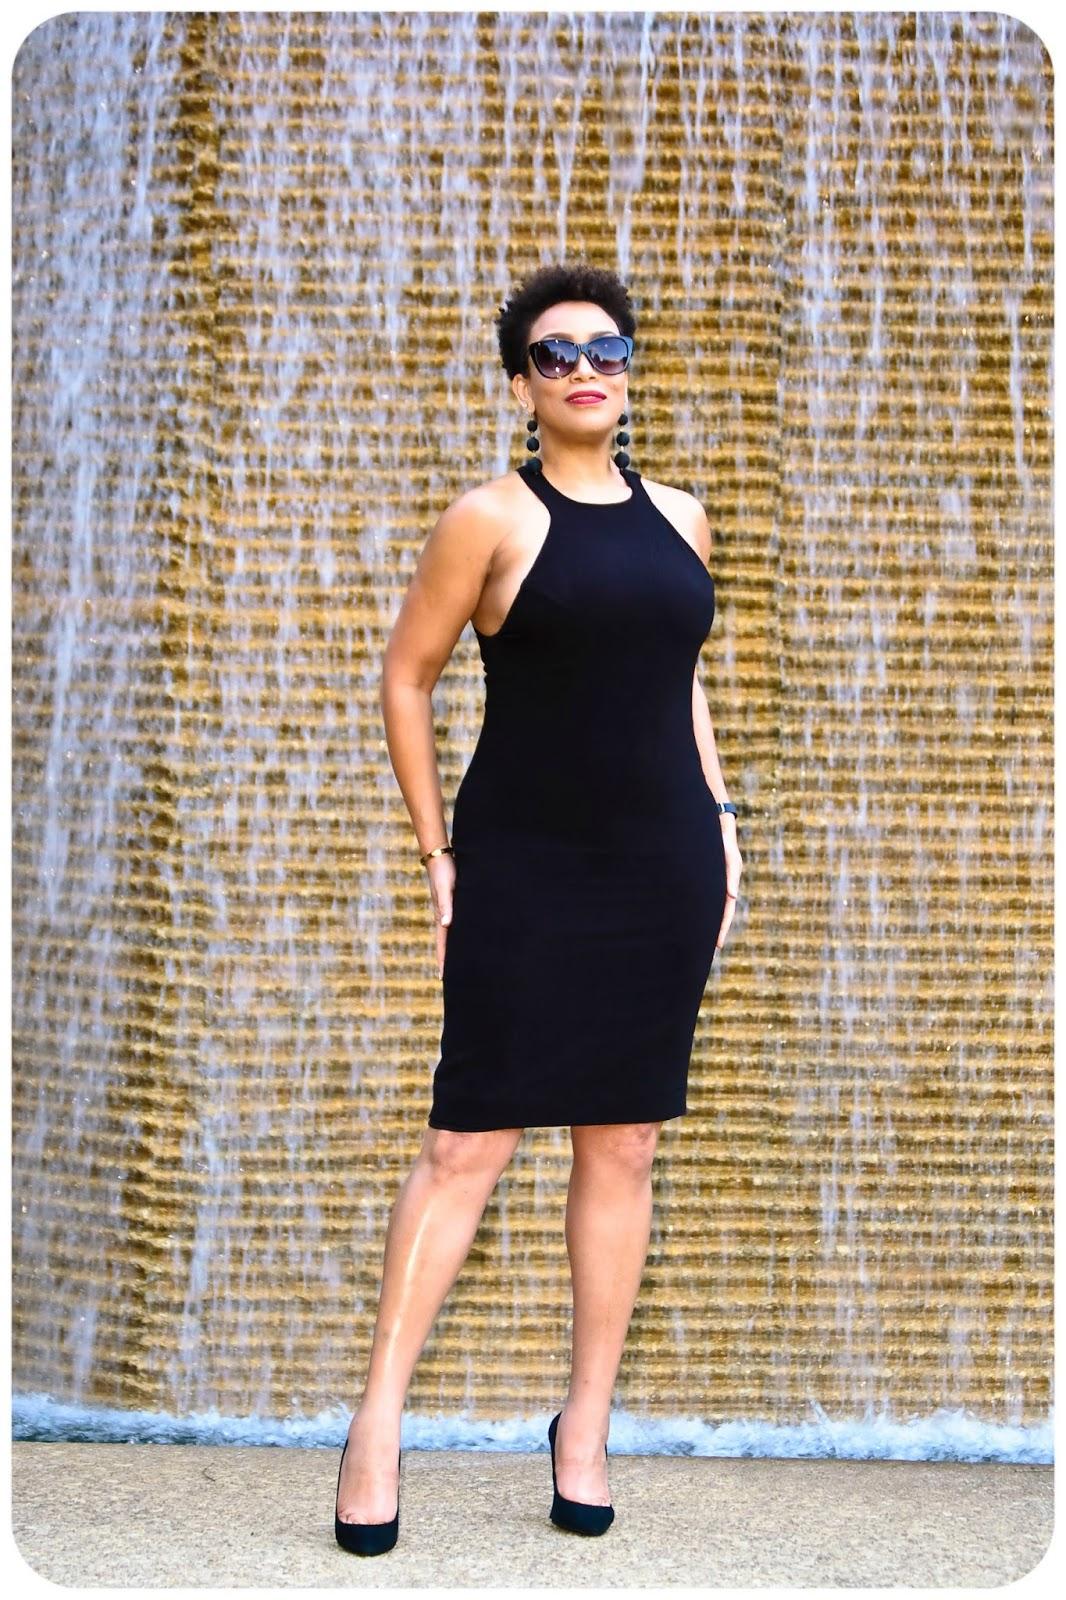 4 Ways To Be More Stylish & Fashionable - Black Dress - Erica Bunker DIY Style